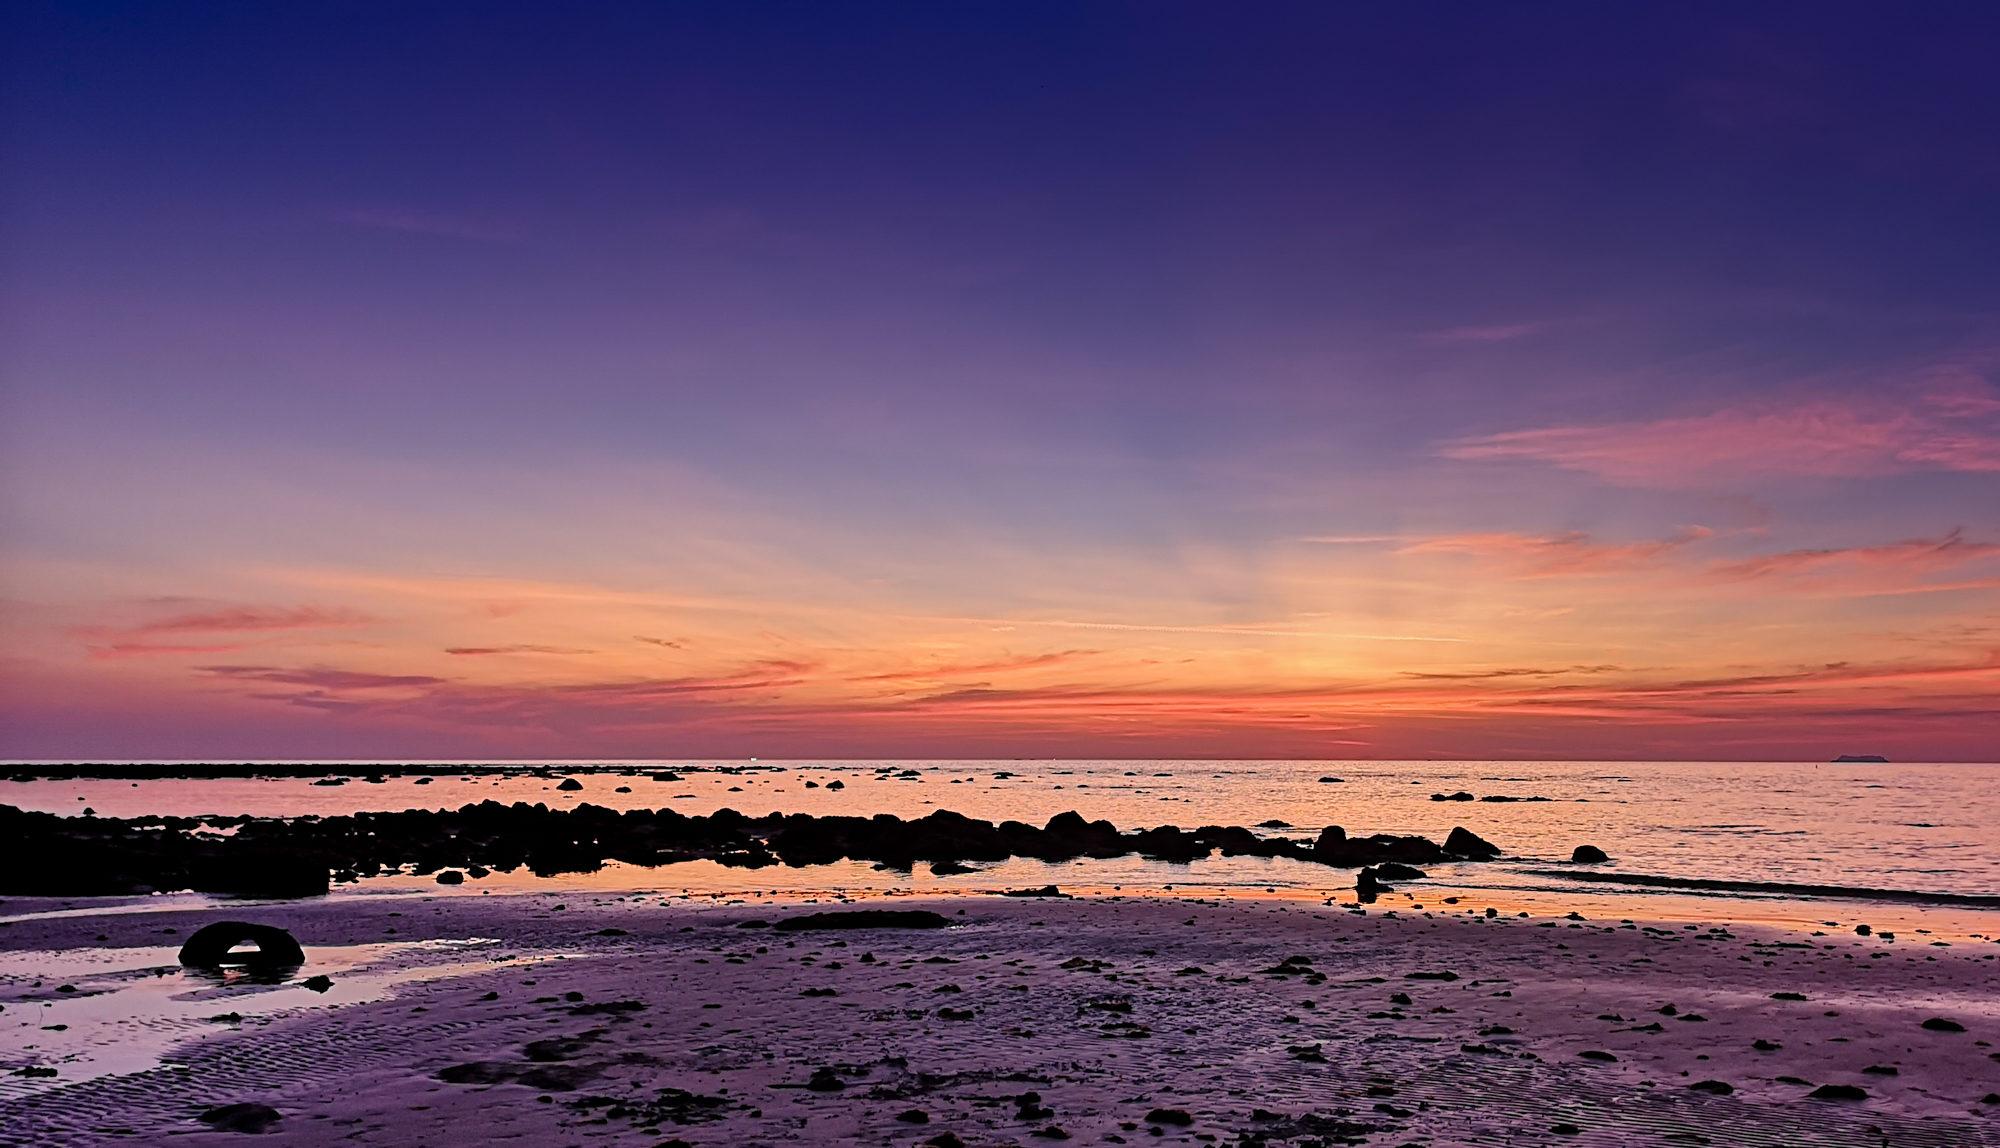 thailand koh lanta purple sunset